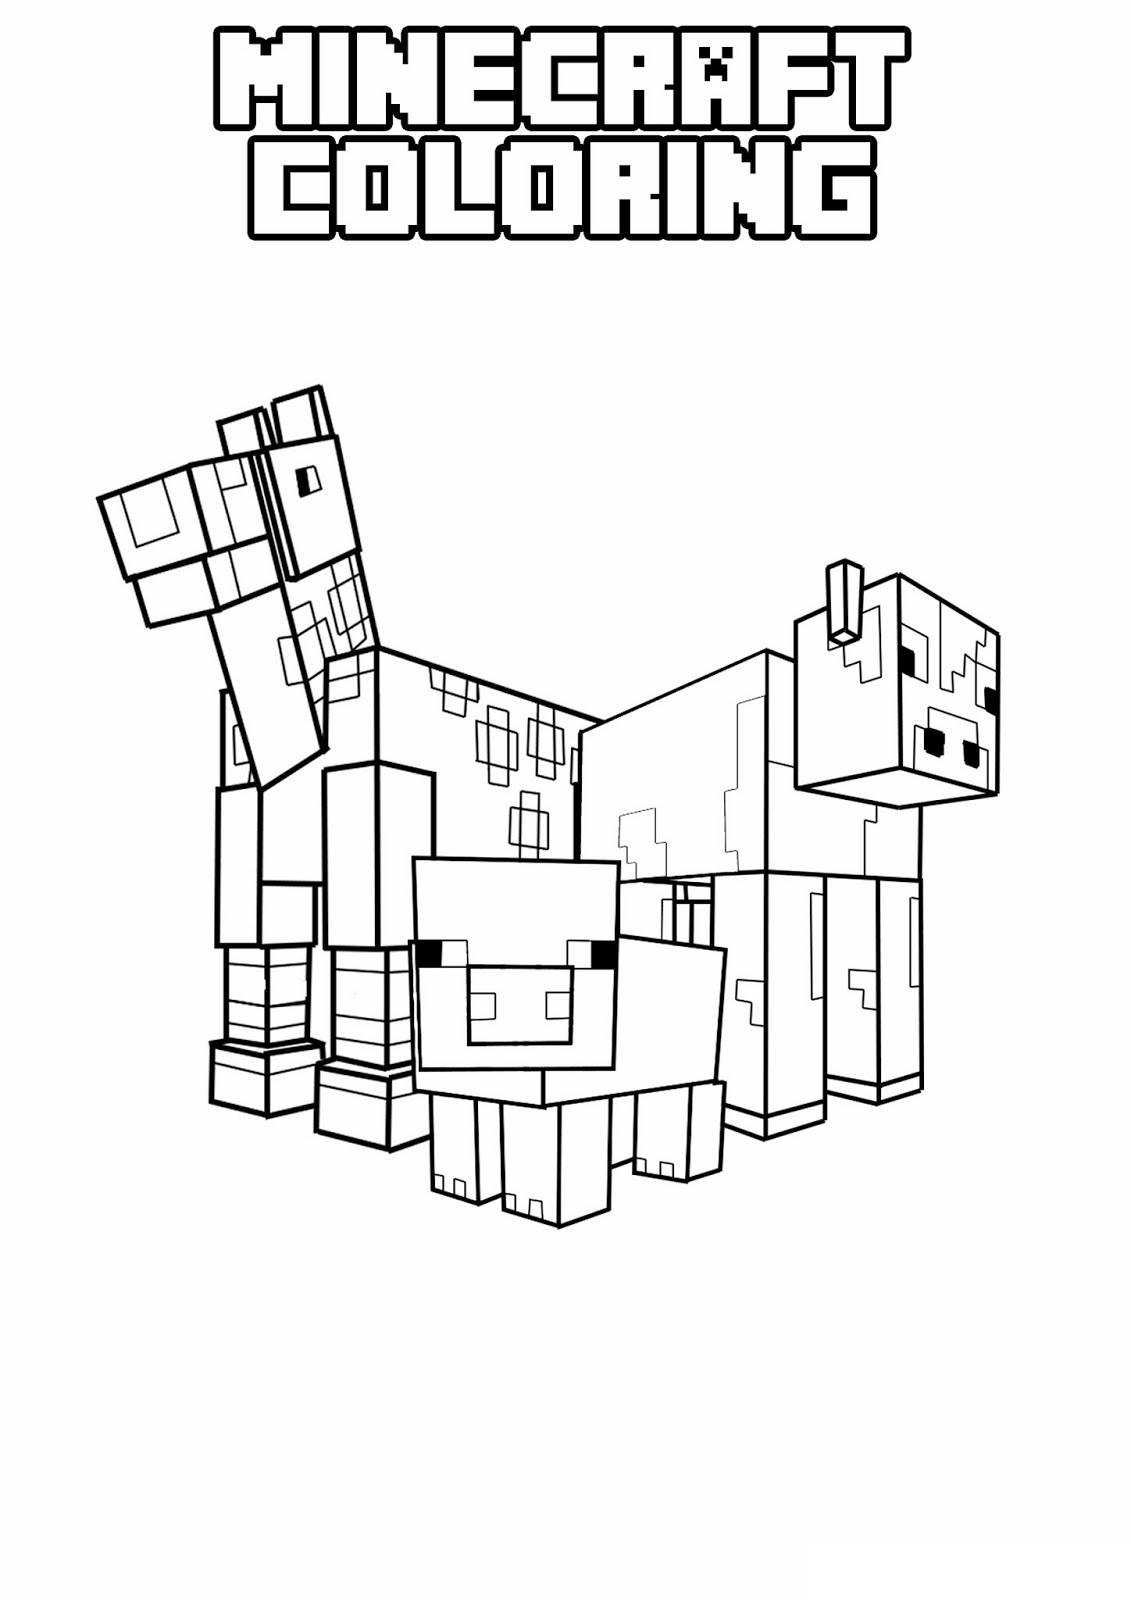 Kleurplaten Minecraft Paard.Kleurplaten Minecraft Paard Nvnpr